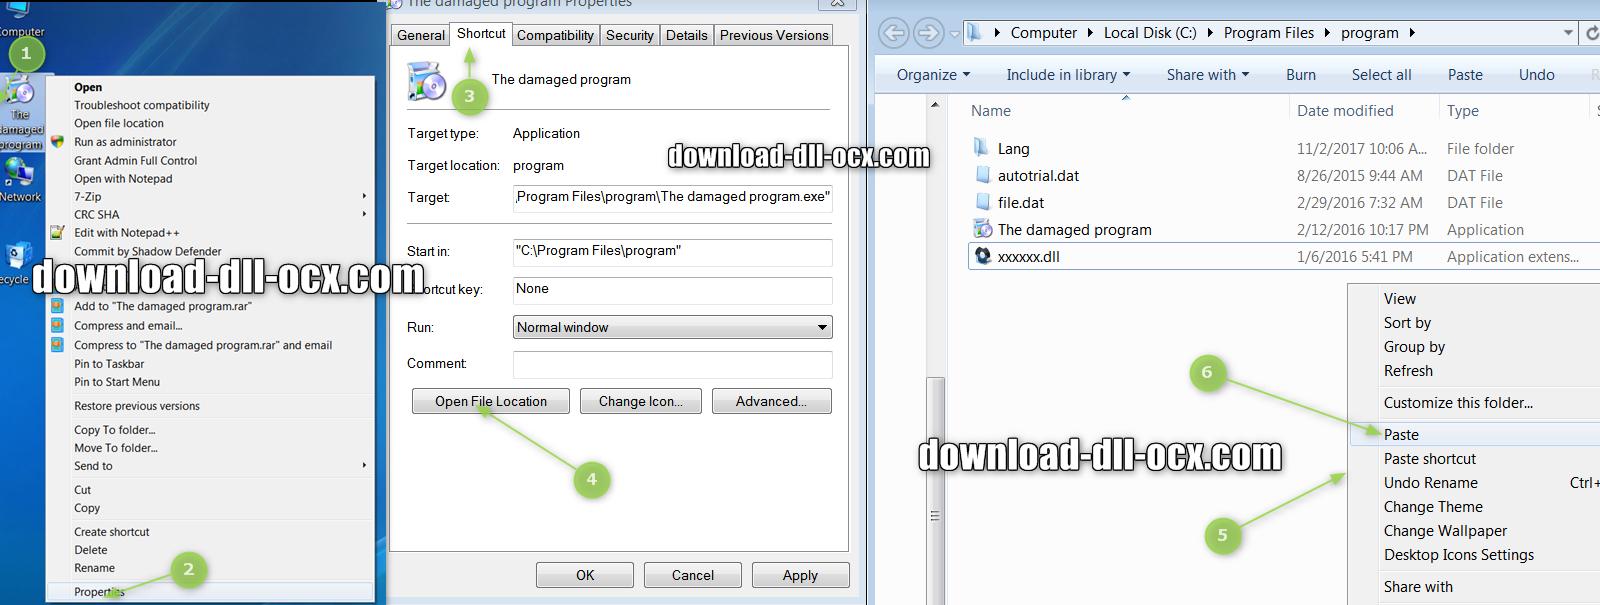 how to install jgidgen.dll file? for fix missing